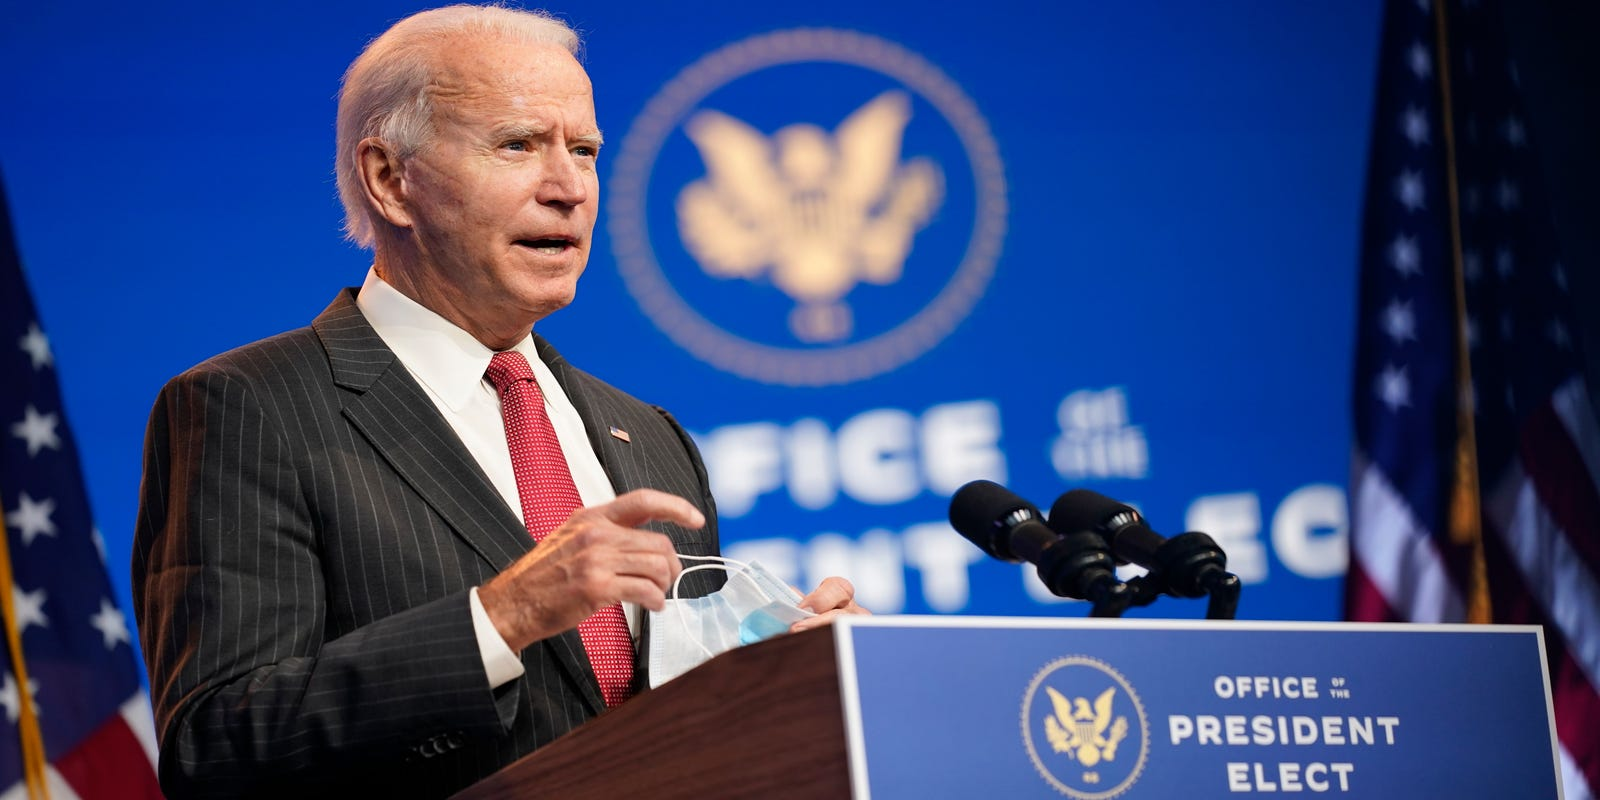 Biden announces economic team with Janet Yellen at Treasury, Neera Tanden at budget office